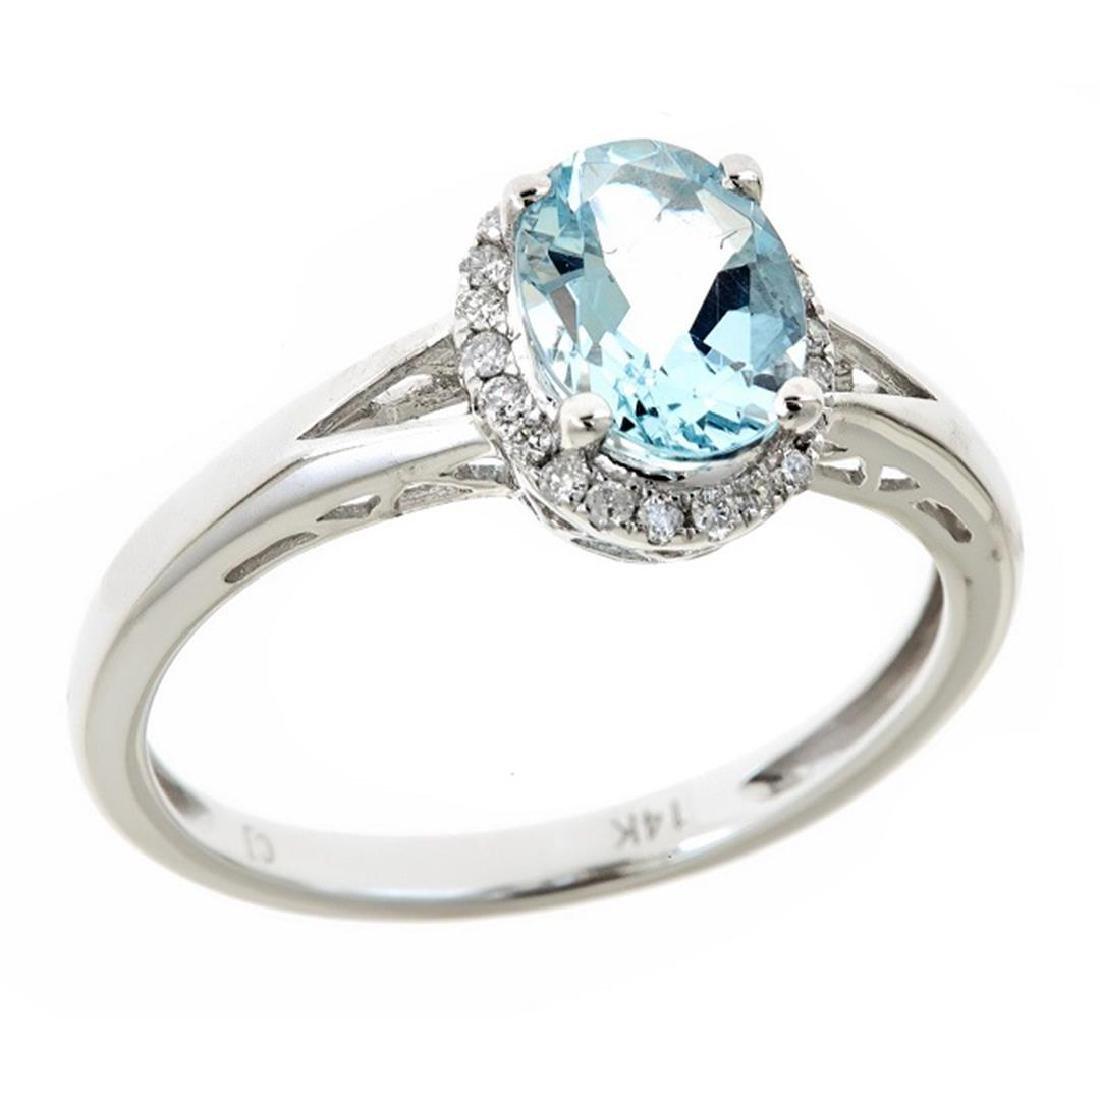 1.21 ctw Aquamarine and Diamond Ring - 14KT White Gold - 2